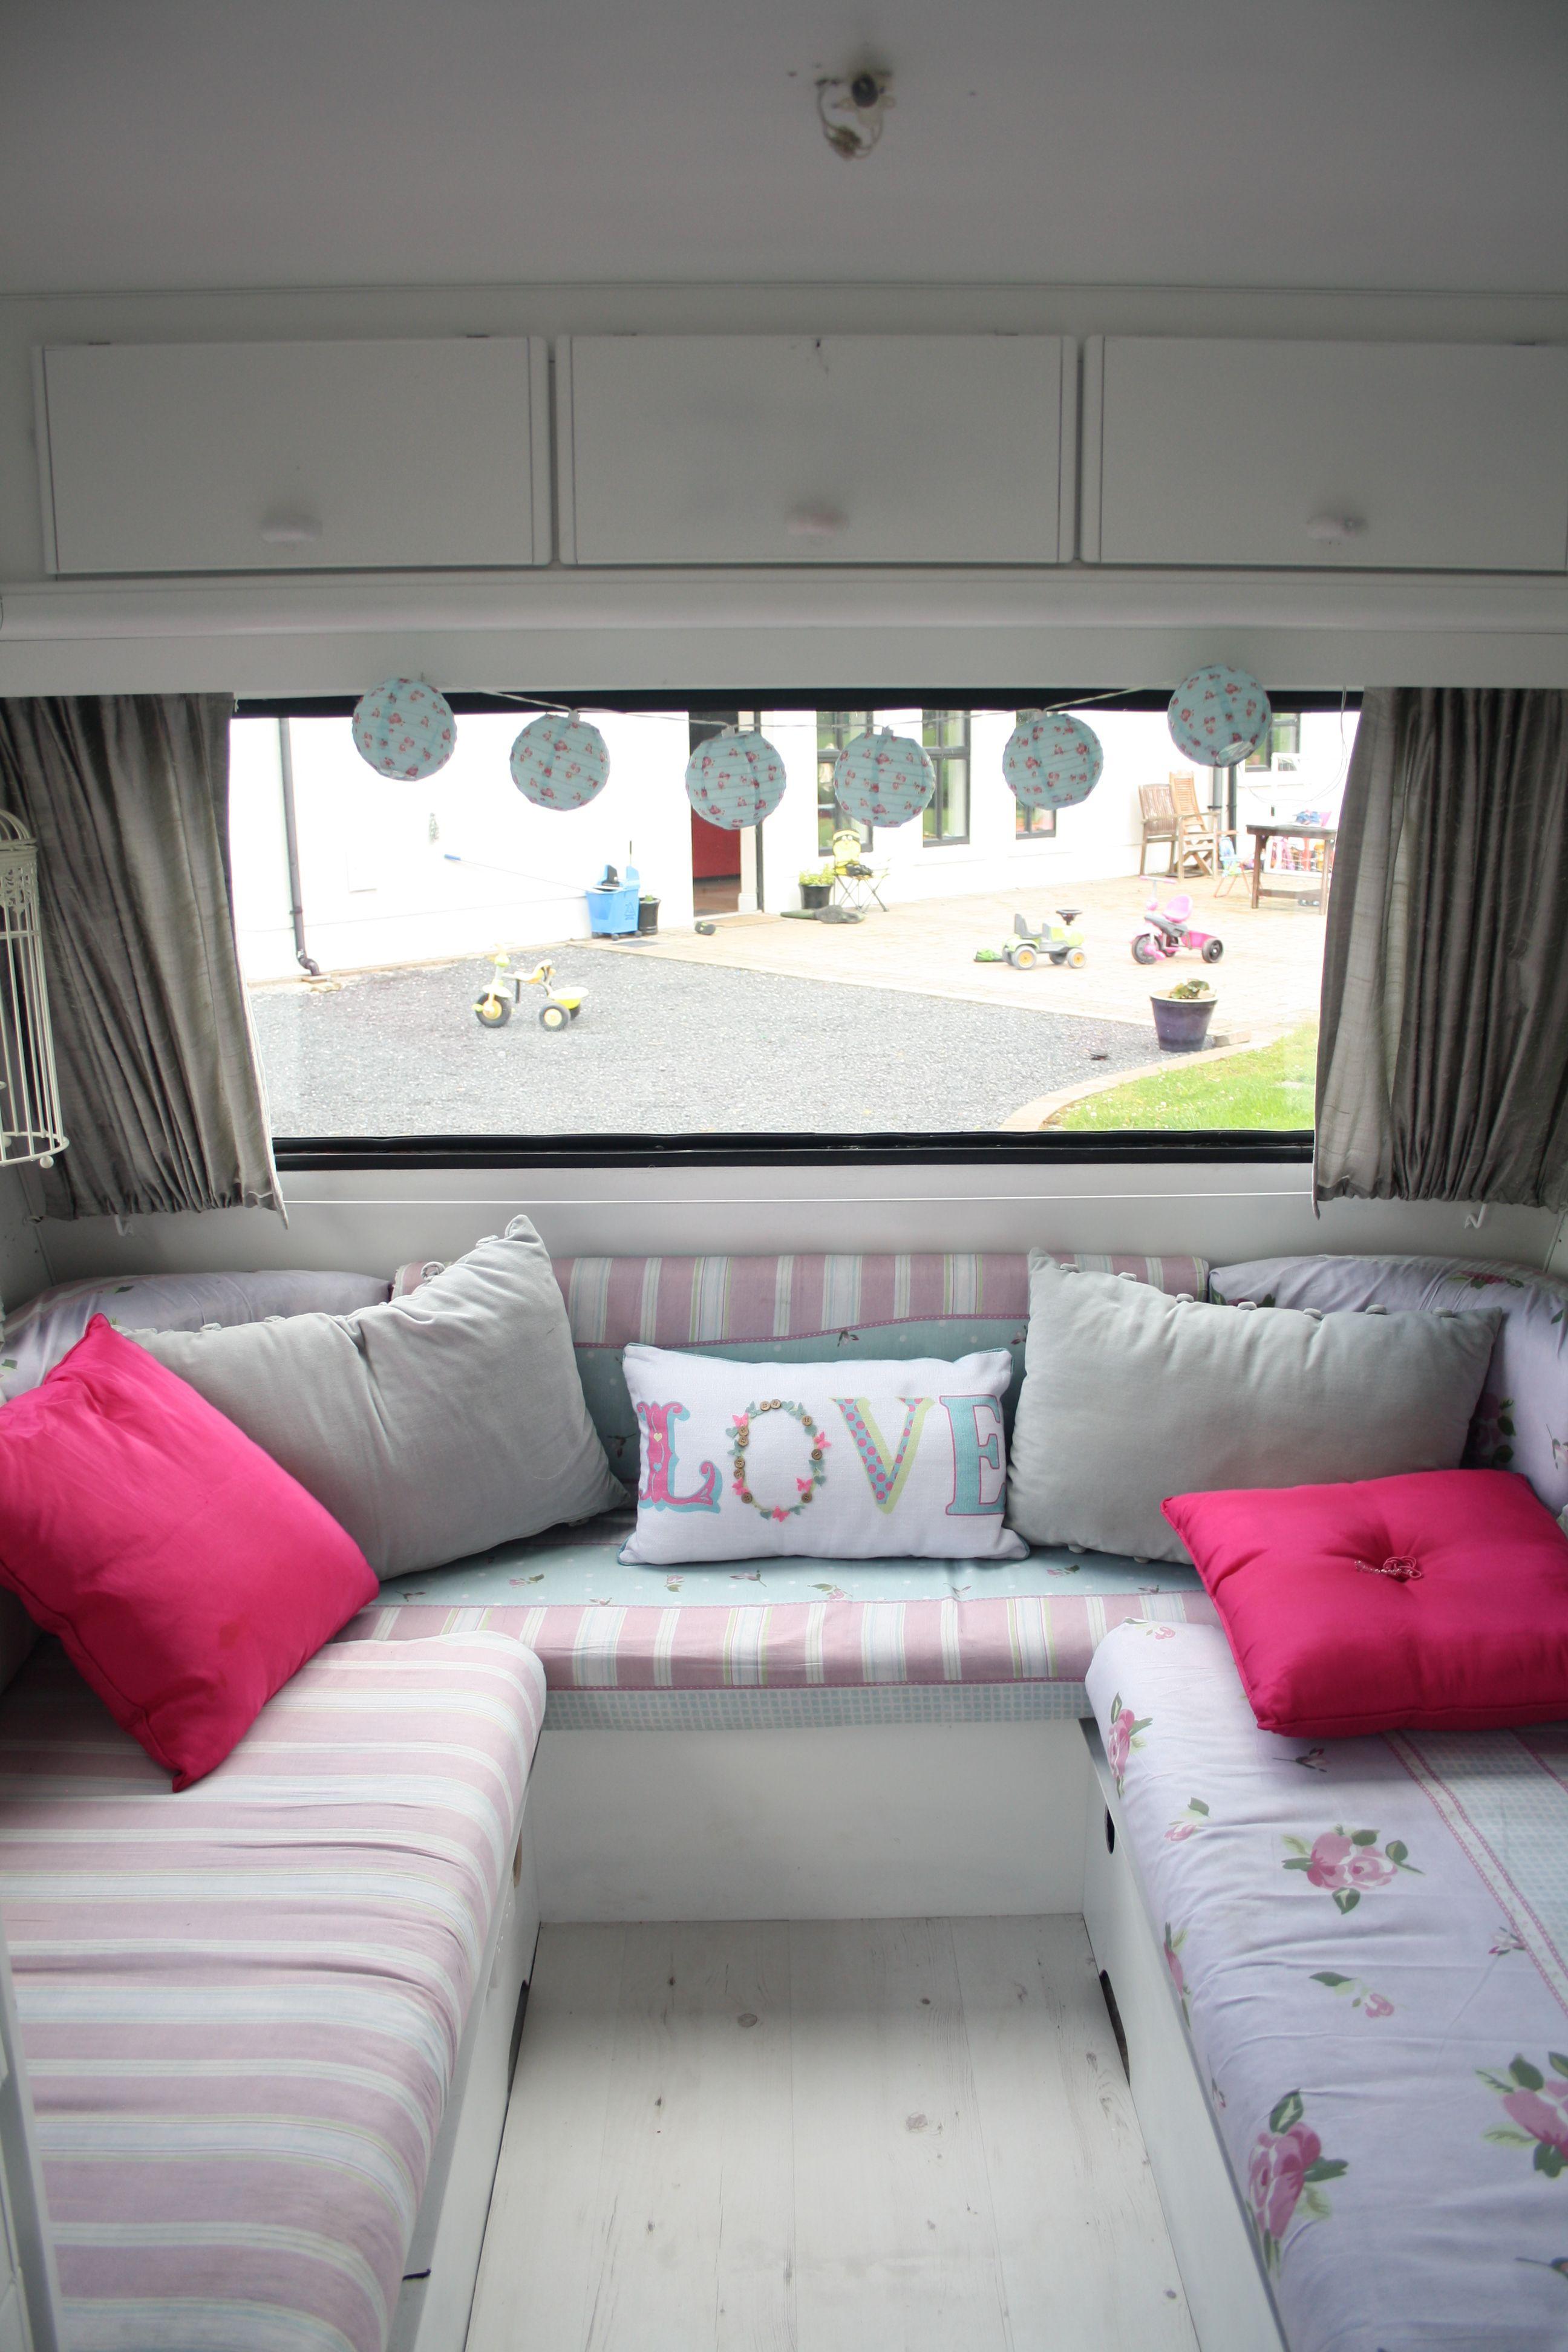 pingl par julie del sur ma caravane pinterest caravane relooking caravane et r novation. Black Bedroom Furniture Sets. Home Design Ideas